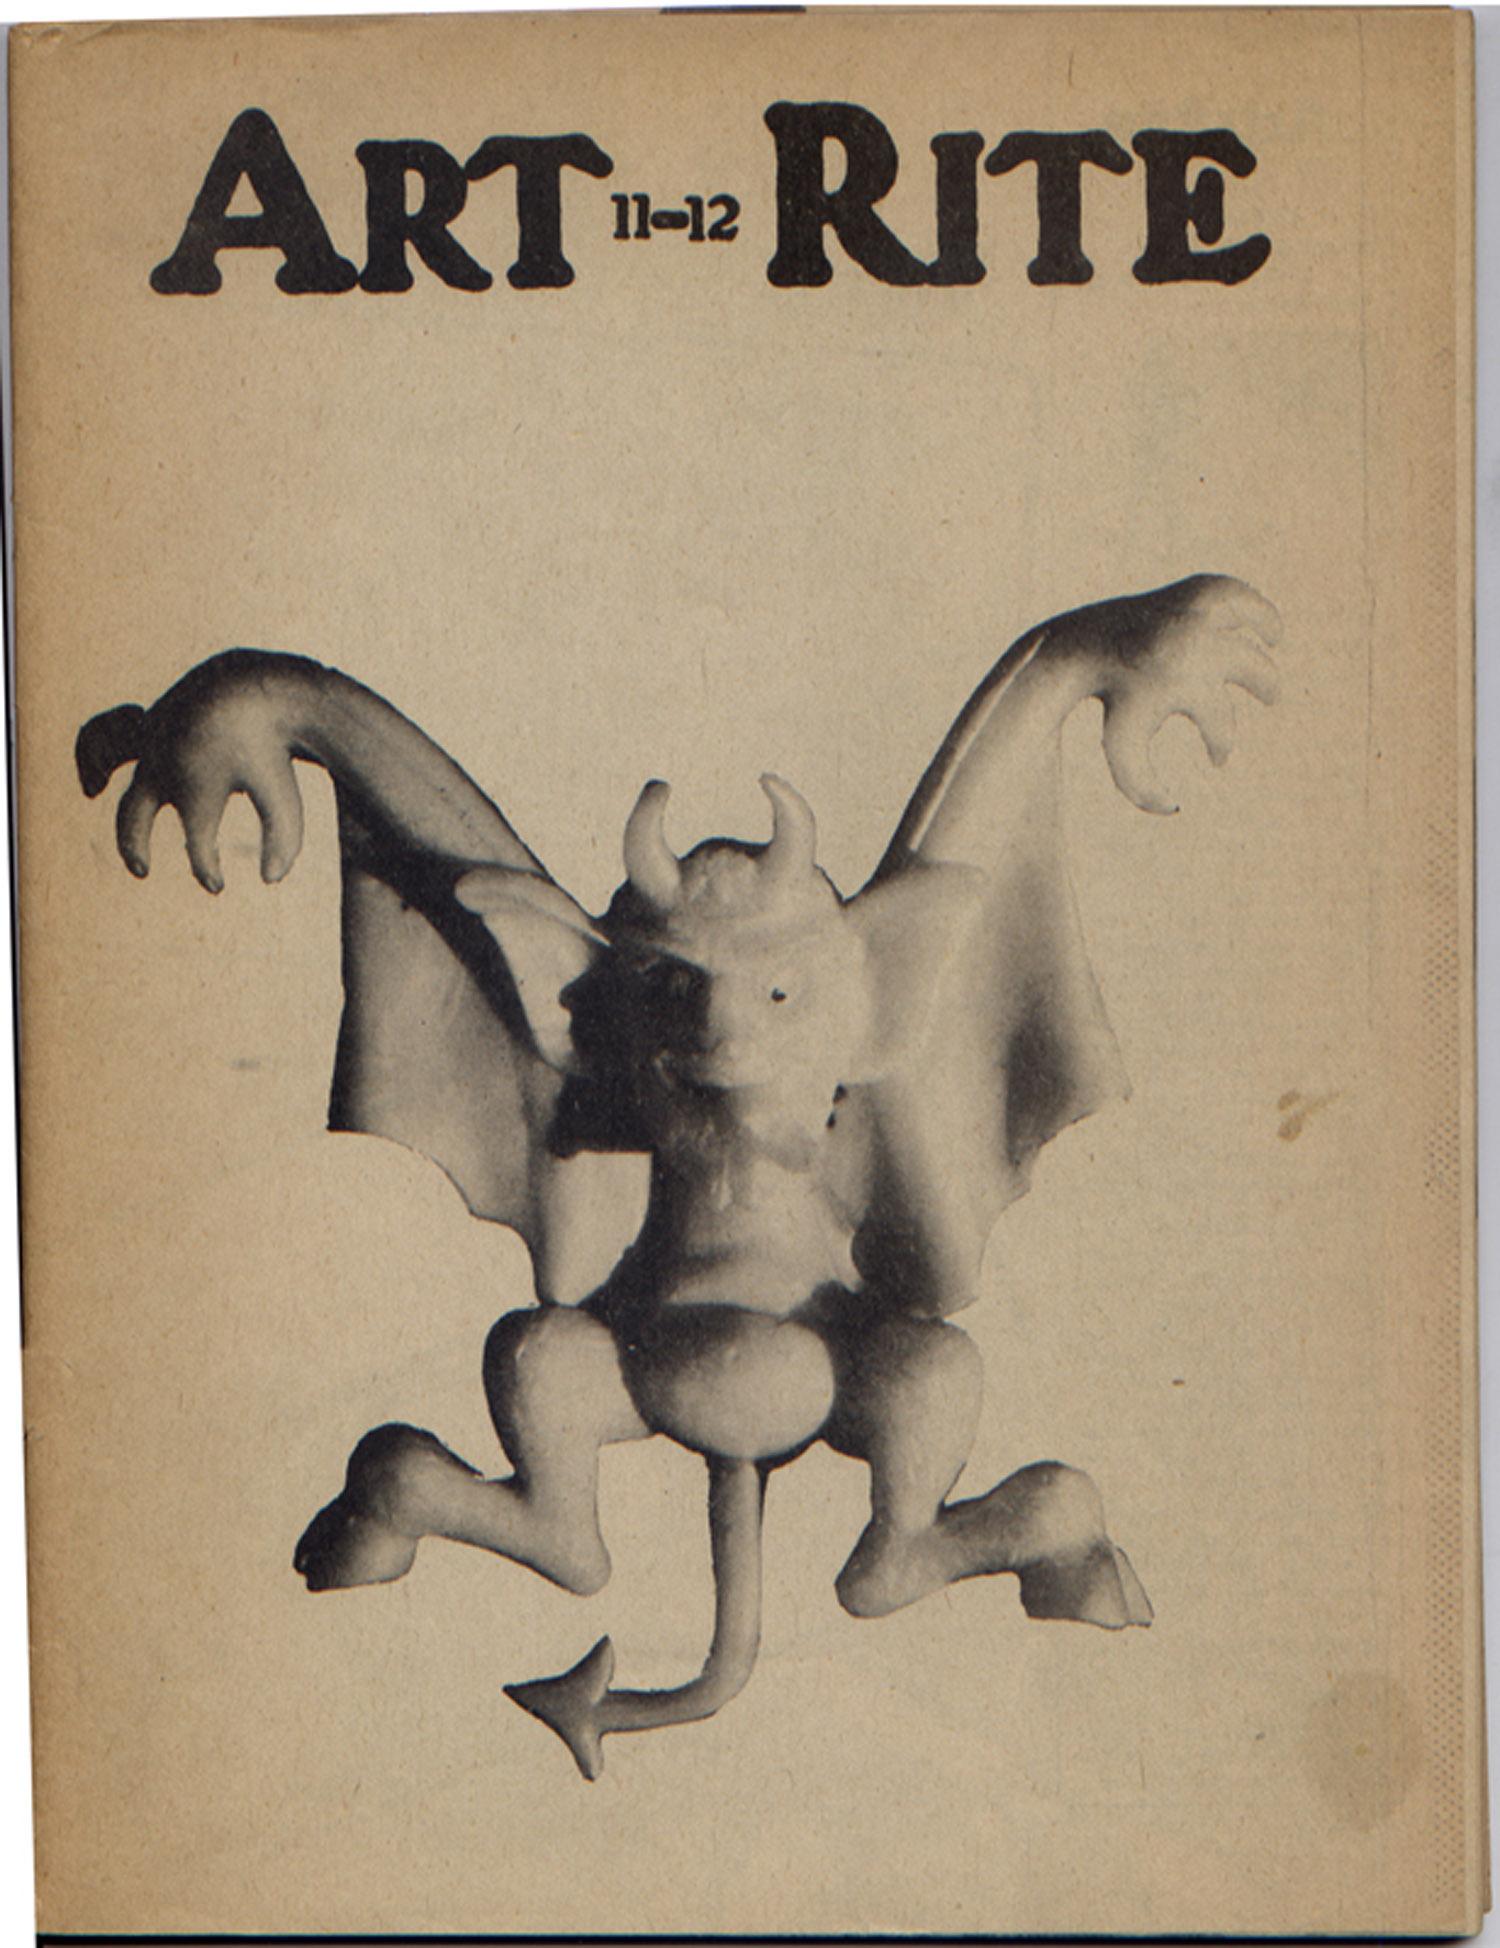 Art-Rite Magazine, Issue No. 11/12, Winter/Spring 1975-76